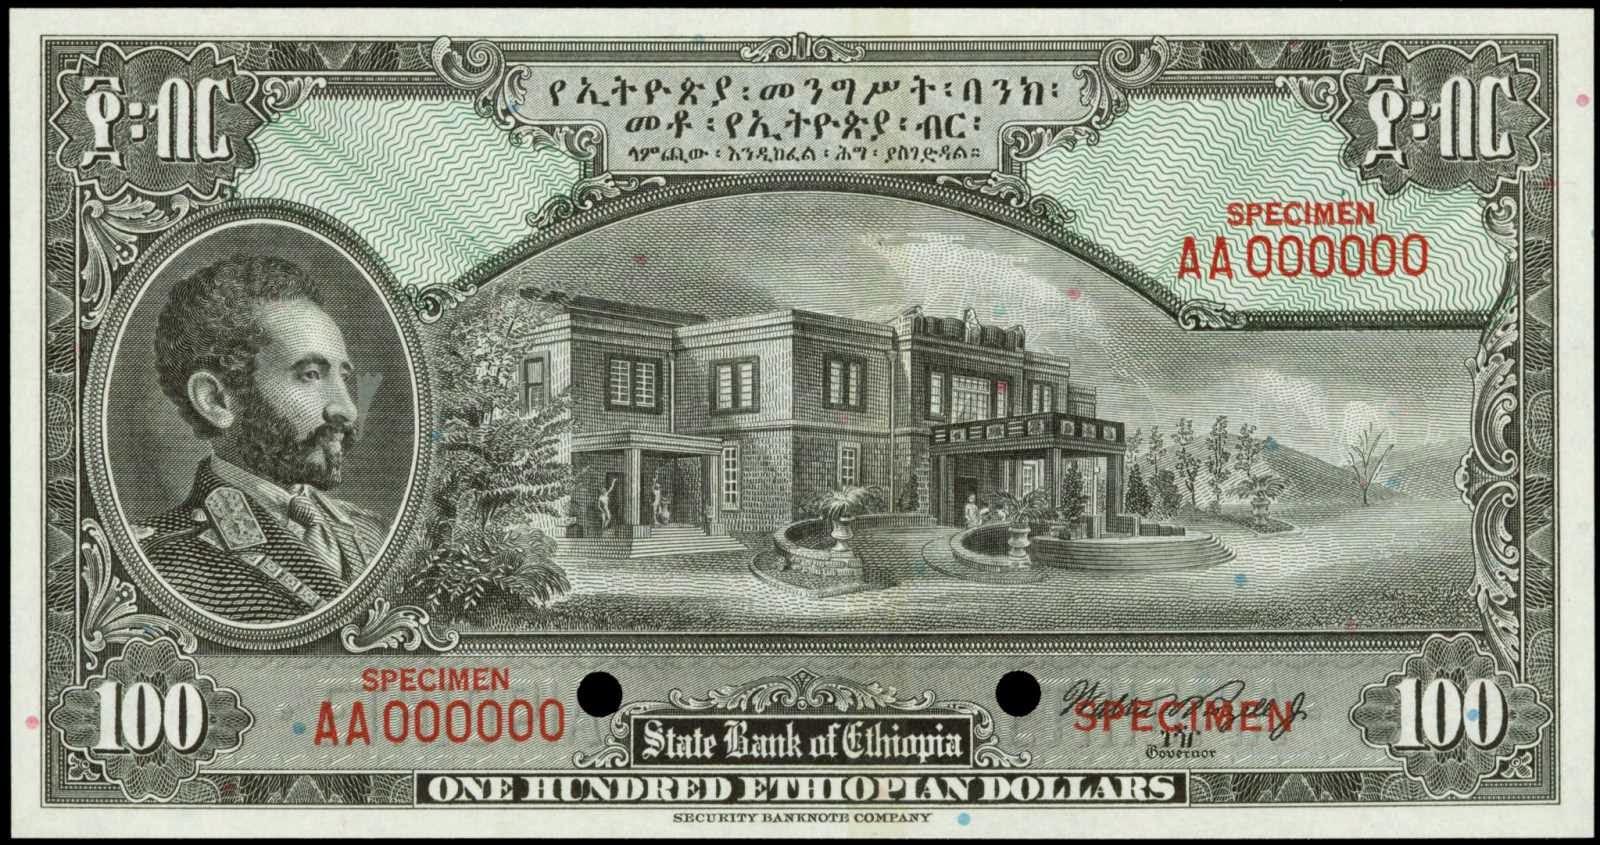 Ethiopia banknotes 100 Dollars note 1945 Emperor Haile Selassie